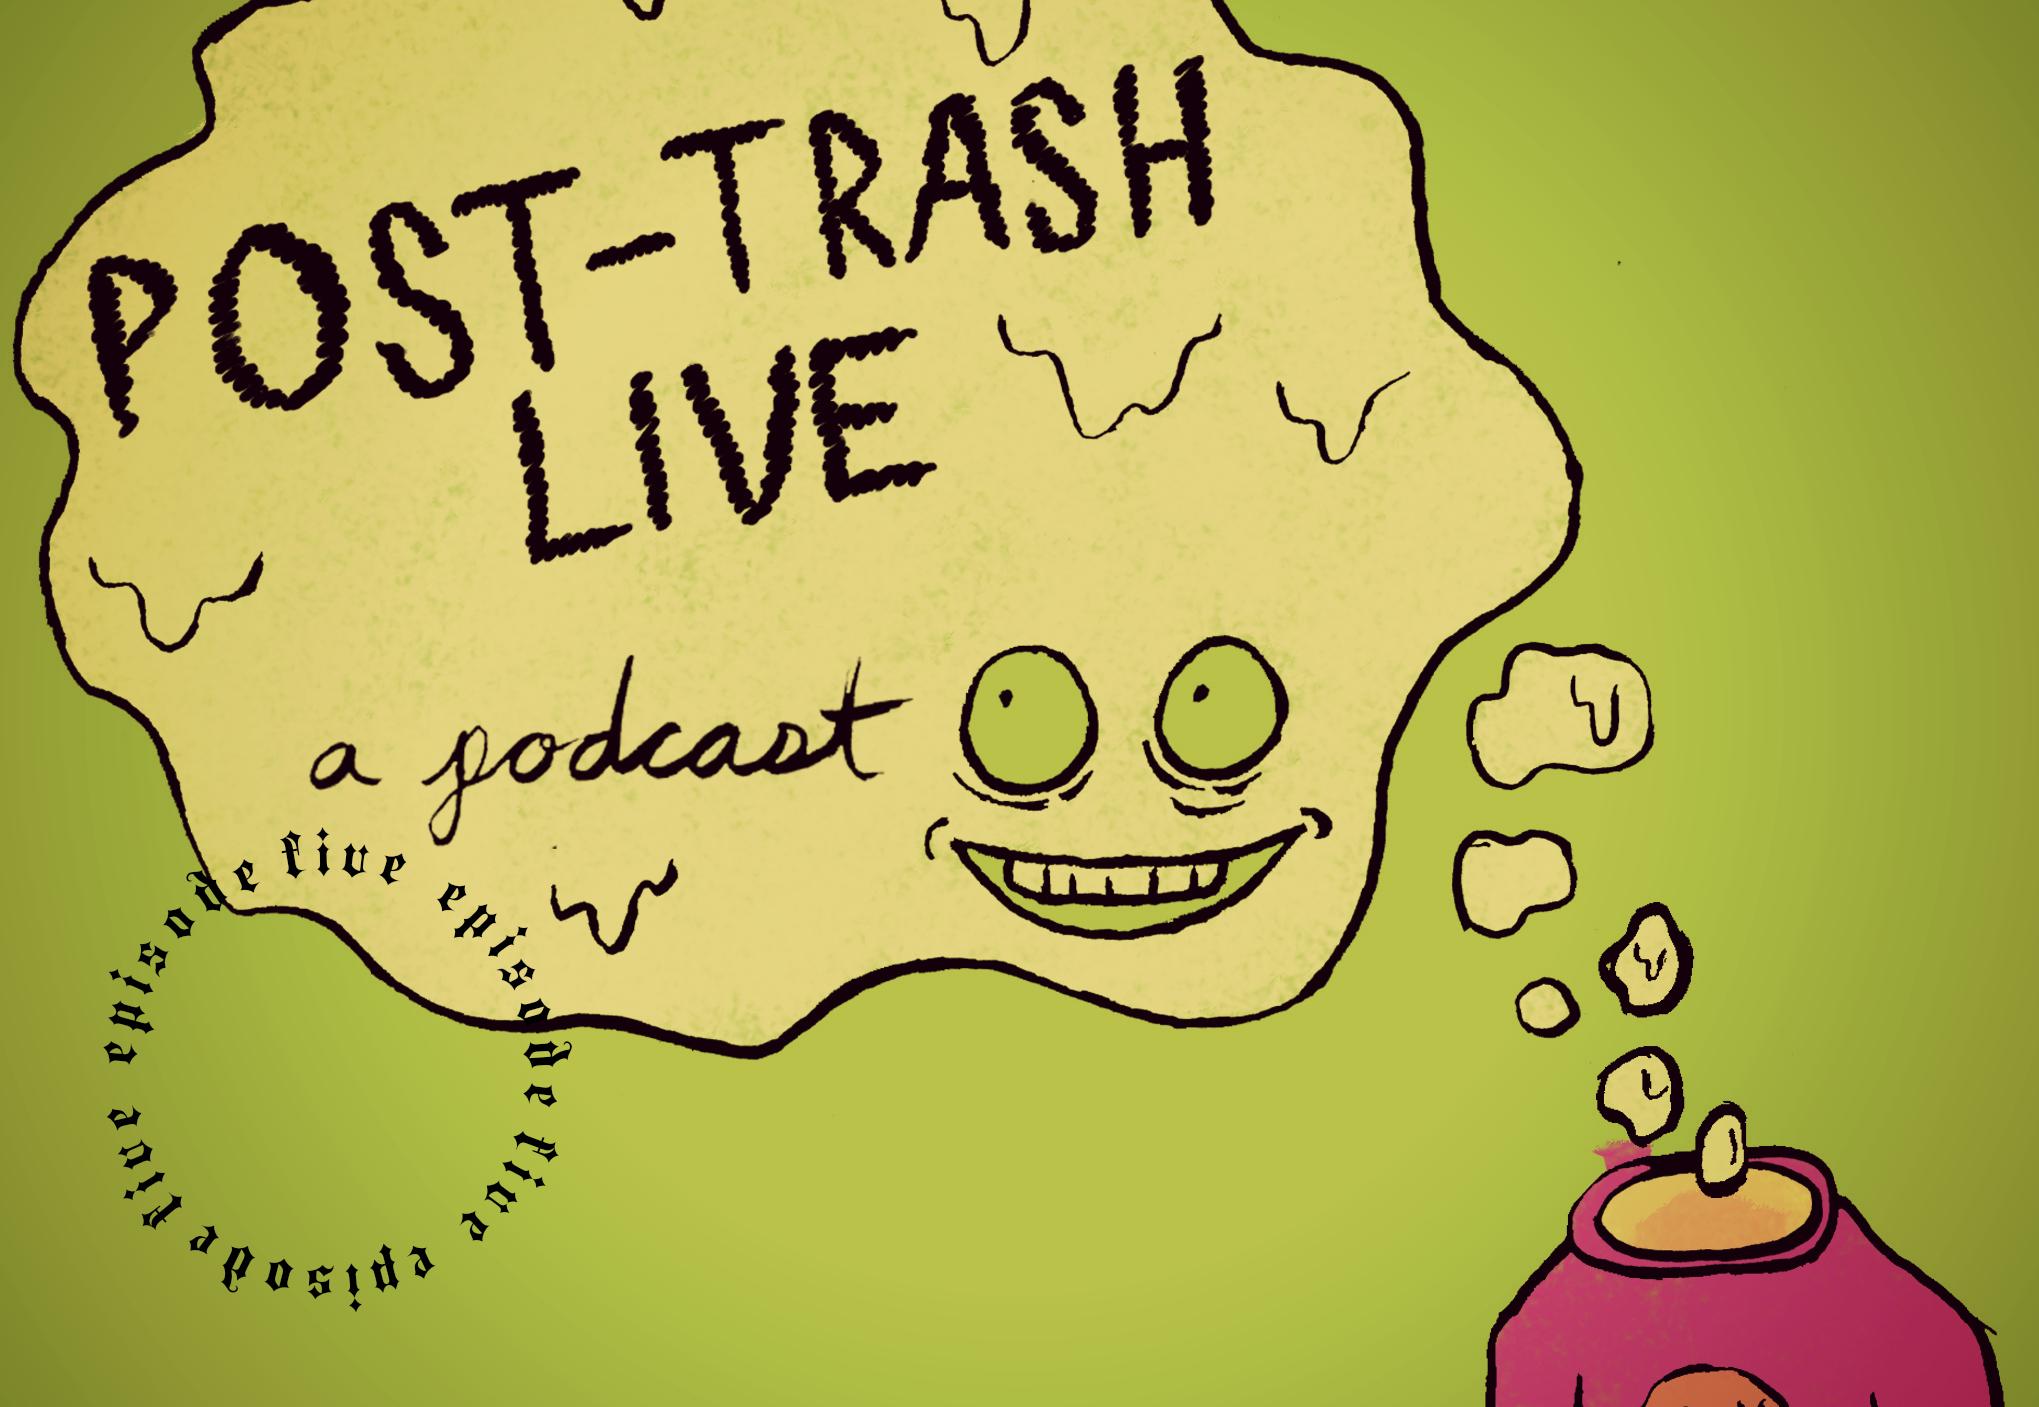 post-trash-podcast_final.jpg